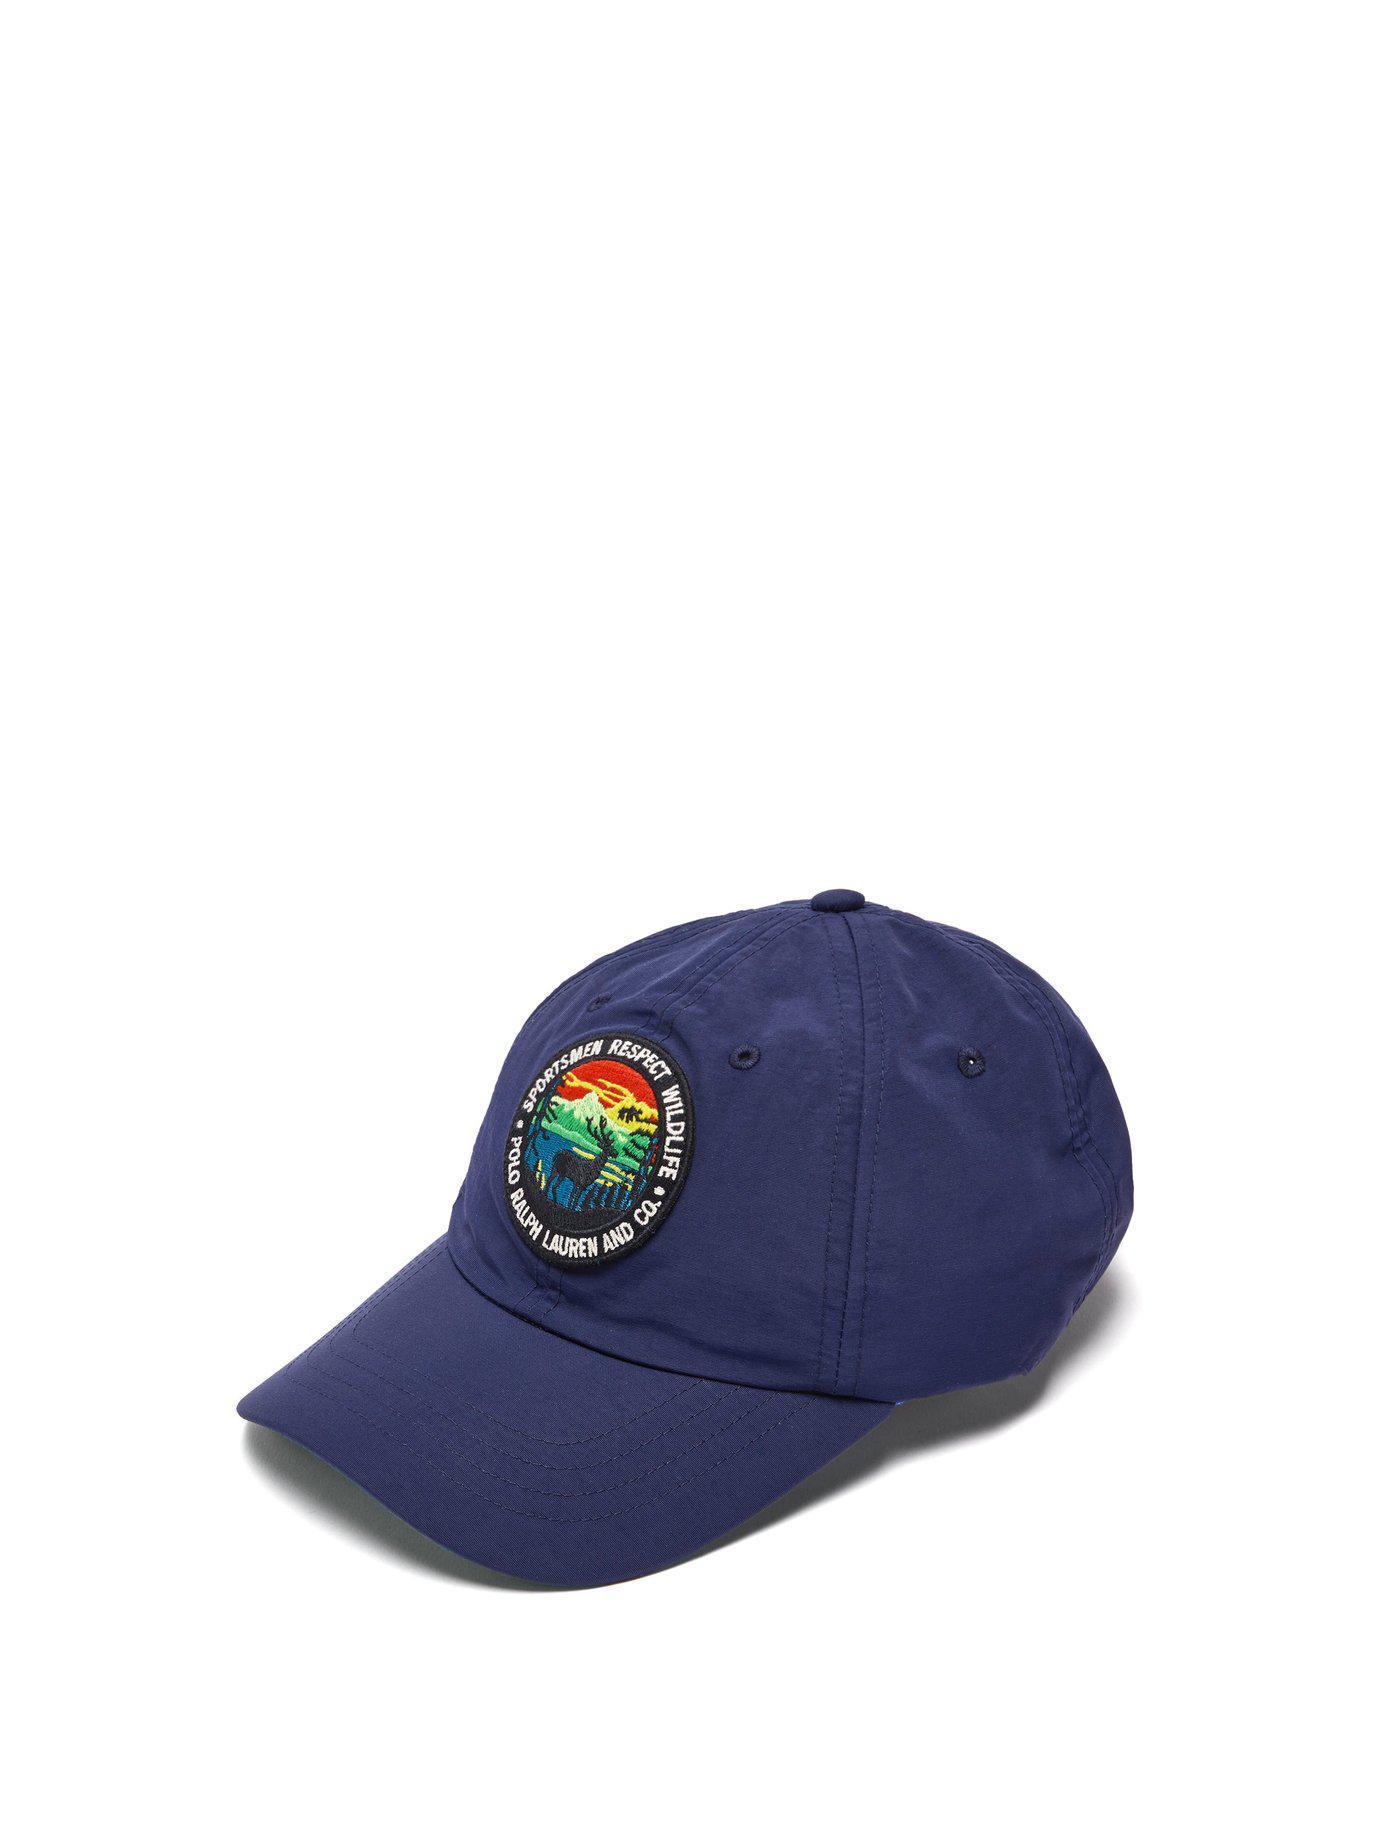 Lyst - Ralph Lauren Purple Label Logo Patch Baseball Cap in Blue for Men a8cbfb96a1a0